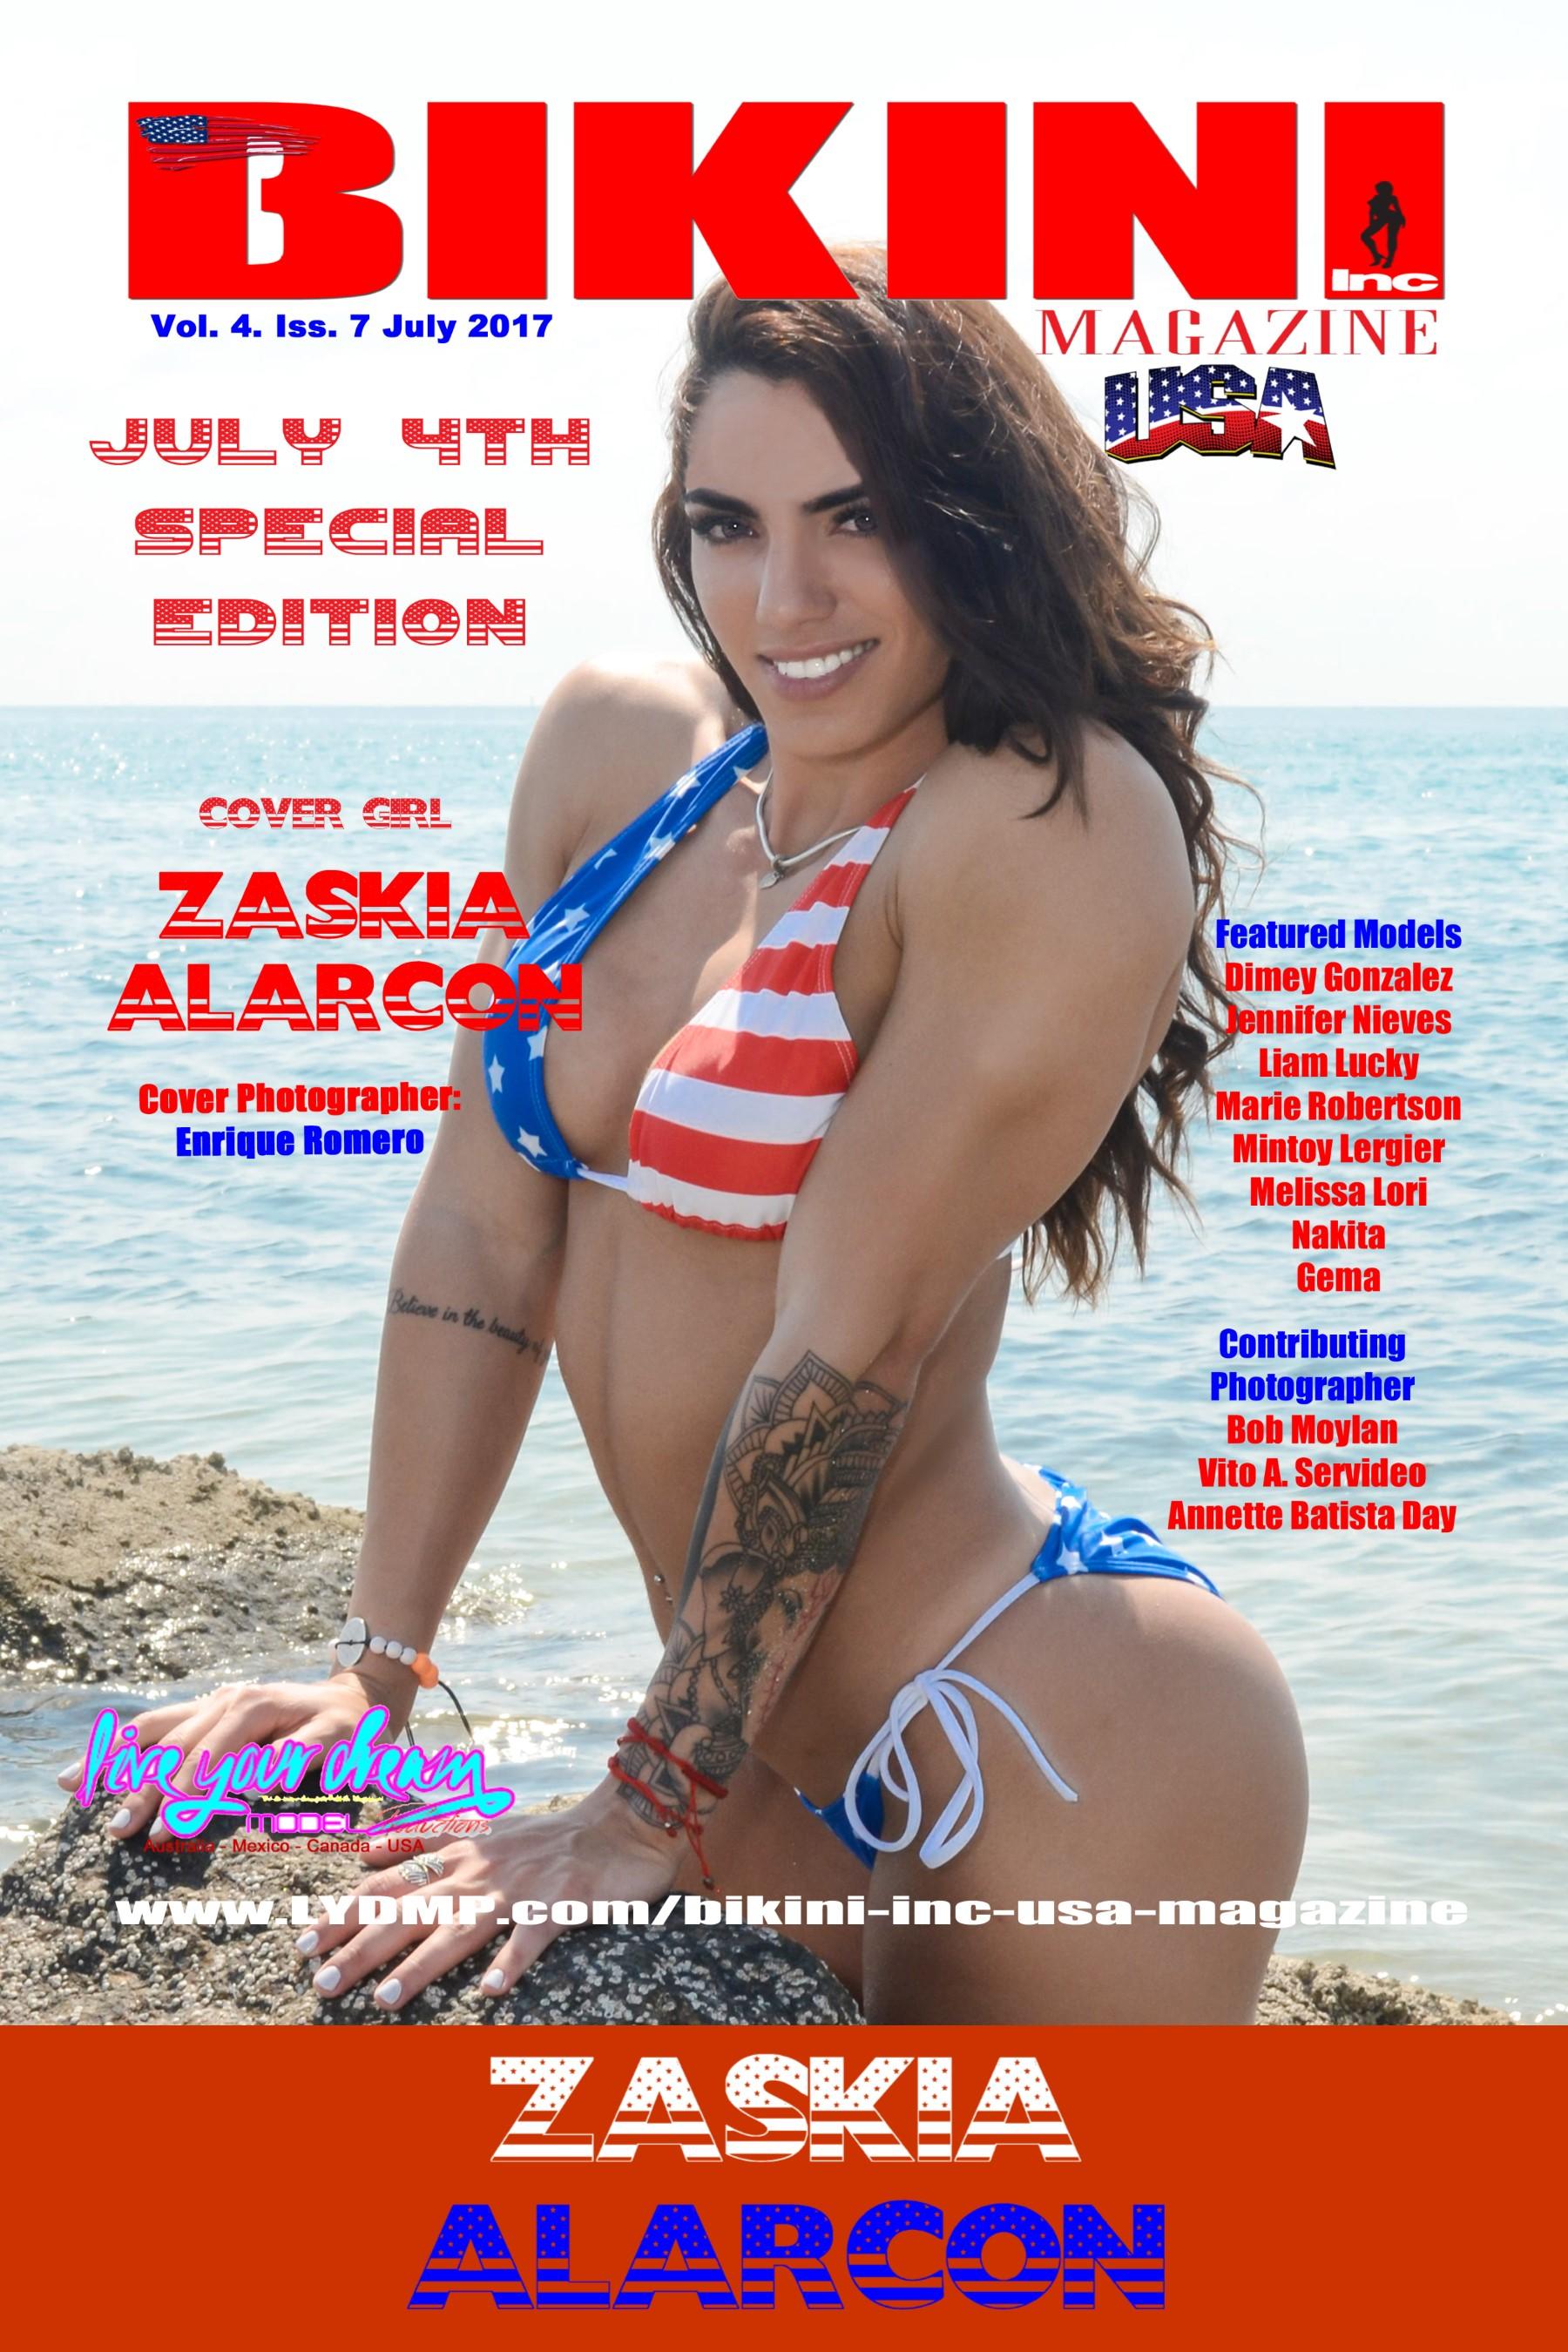 Jul 2017 - Special Edition